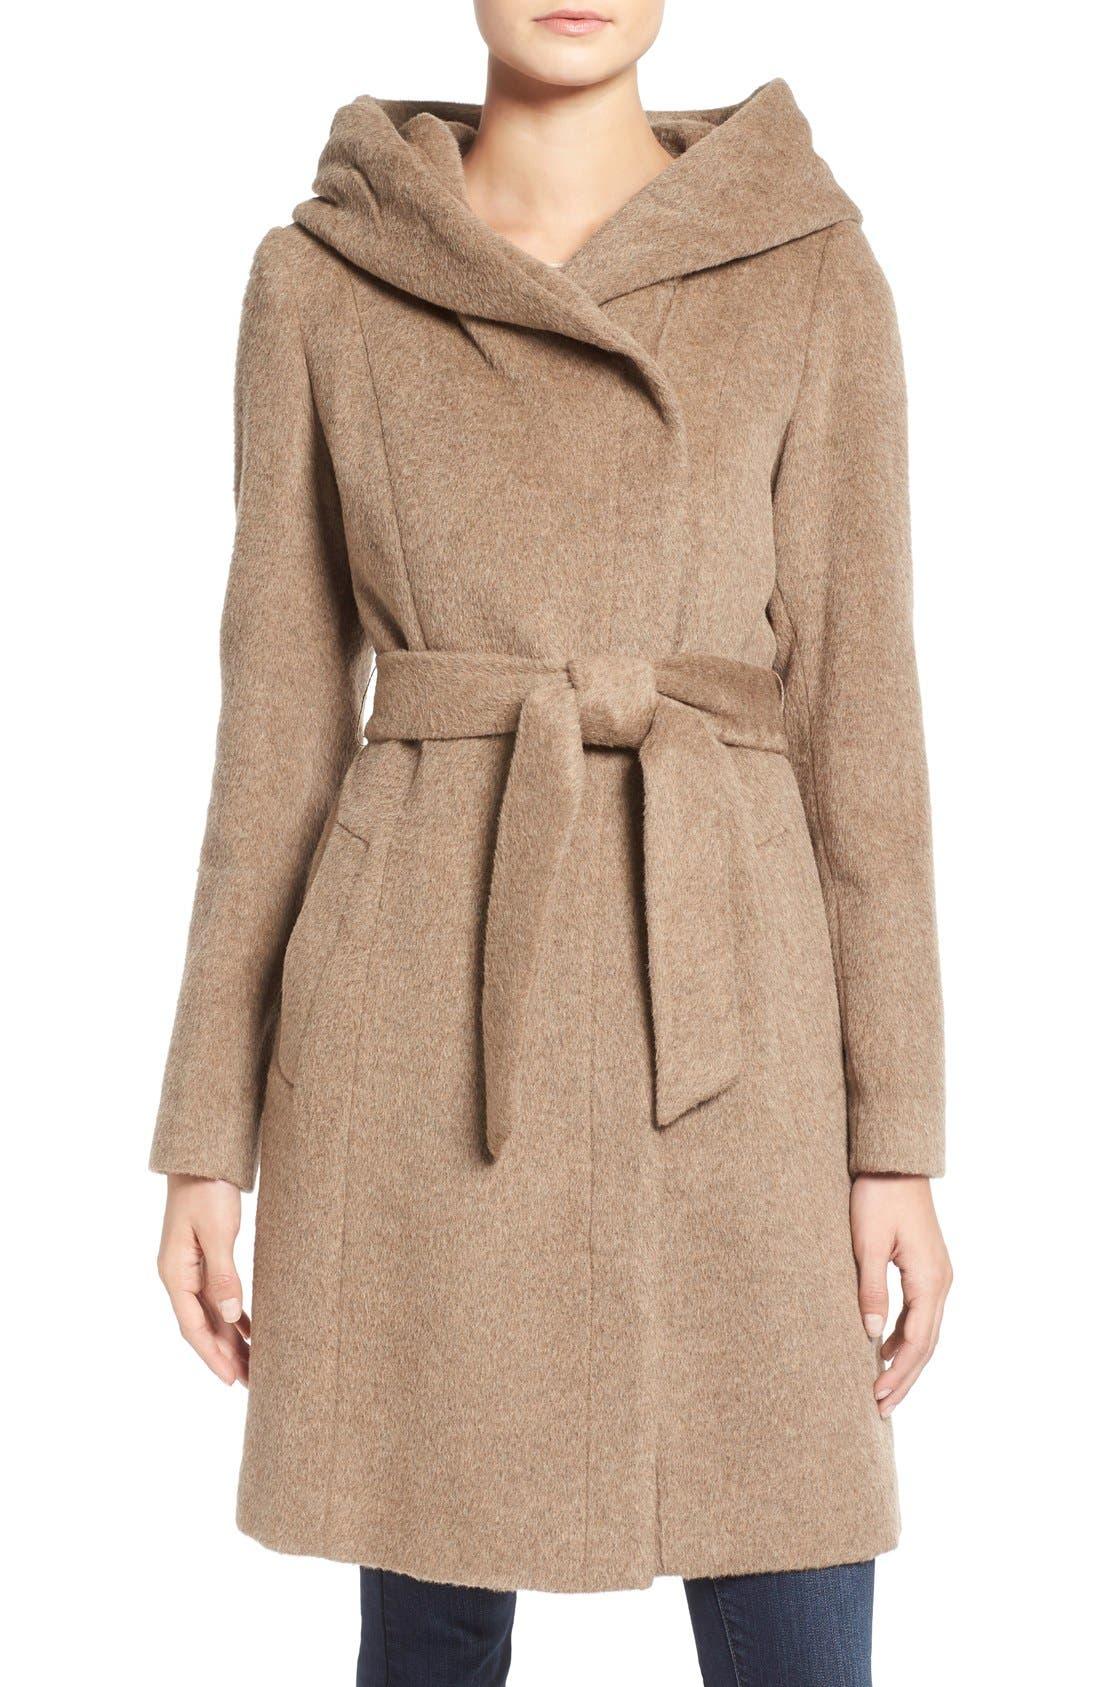 Alternate Image 1 Selected - Cole HaanAlpaca & Wool Wrap Coat